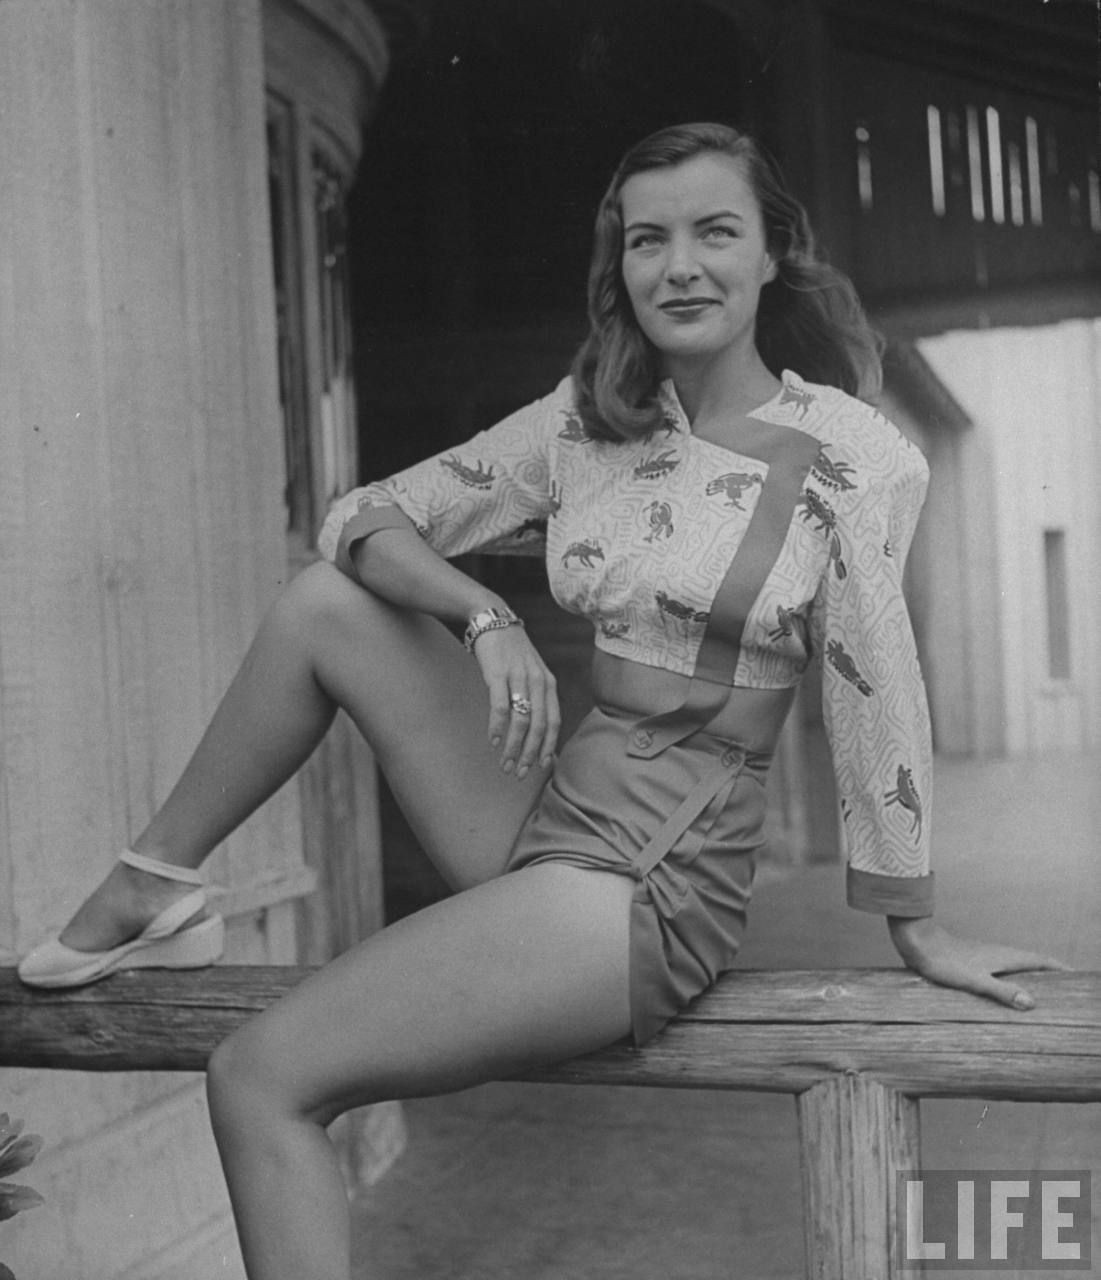 Модный показ, США, 1945. Уолтер Сандерс